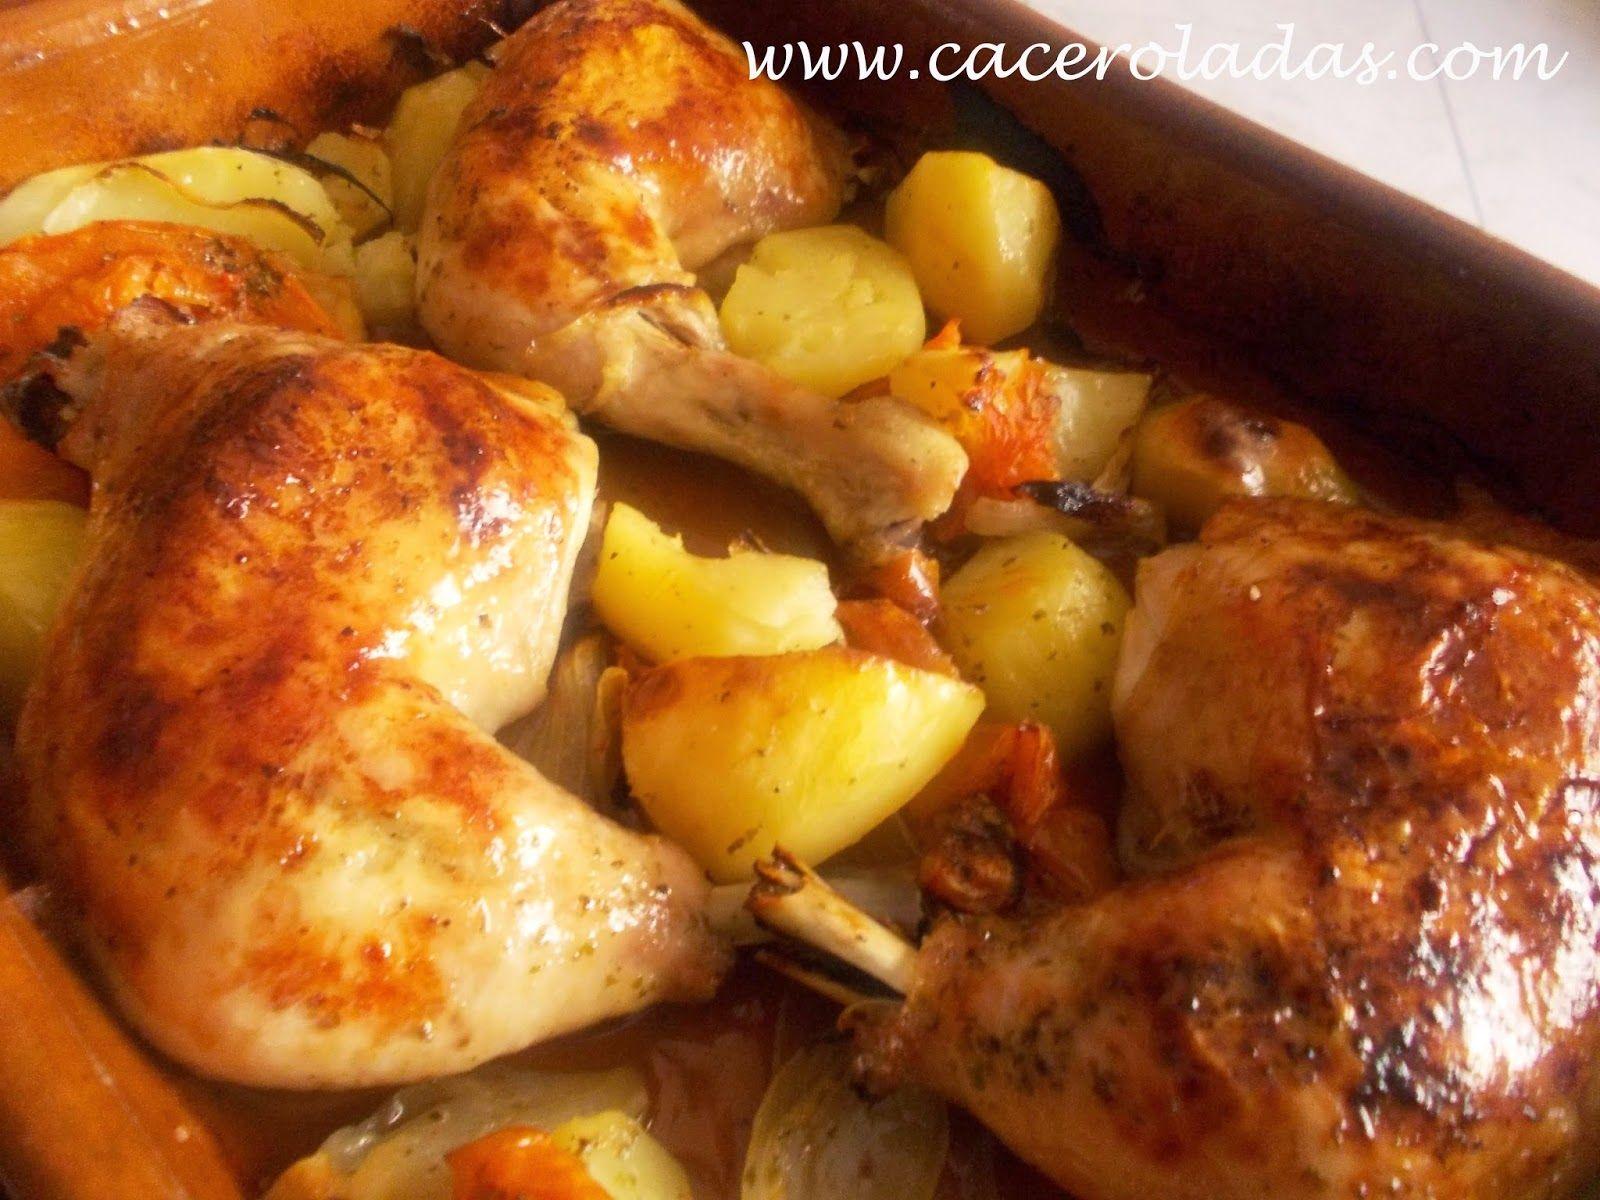 Caceroladas Pollo Al Horno Con Patatas Tomates Y Cebolla Pollo Al Horno Con Patatas Pollo Pollo Al Horno